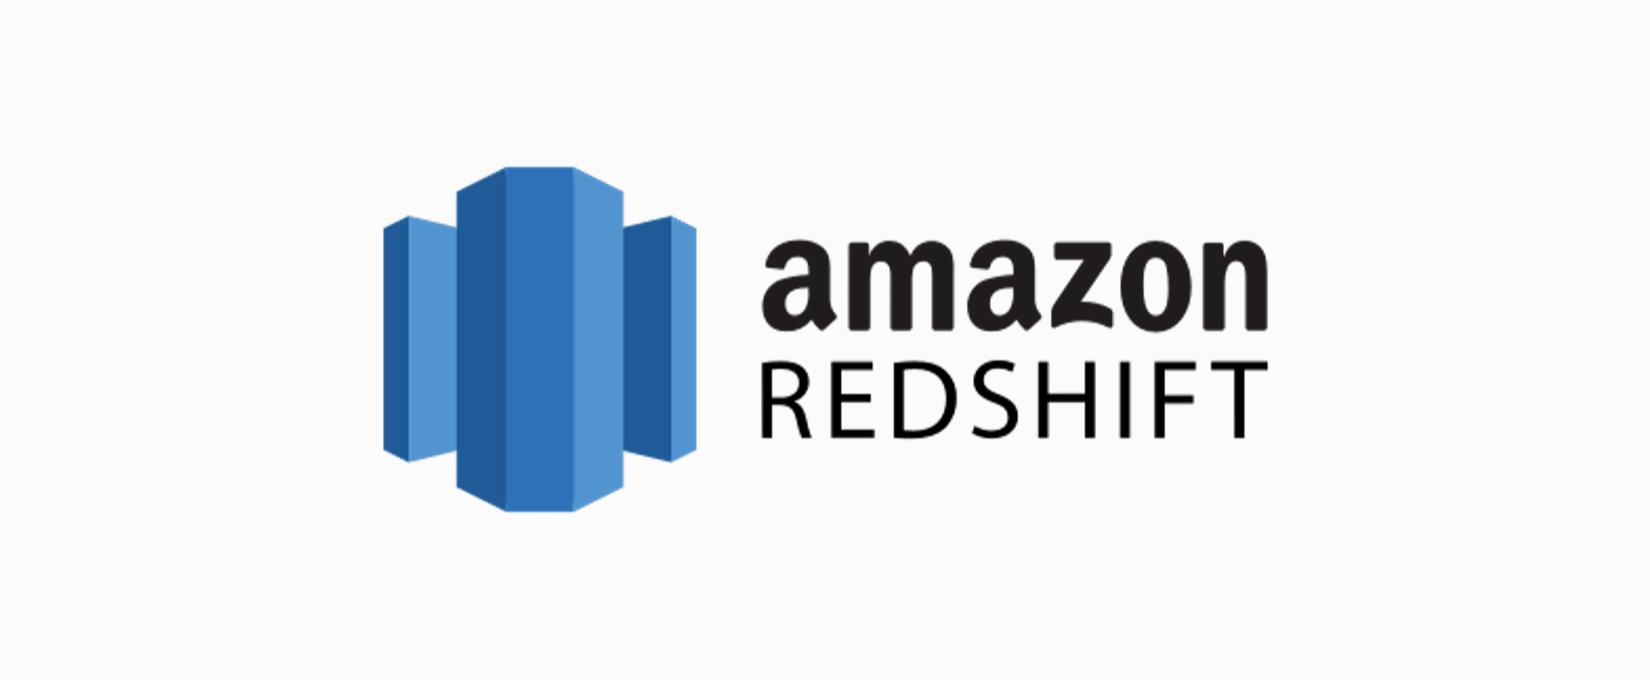 Amazon Redshift Logo.